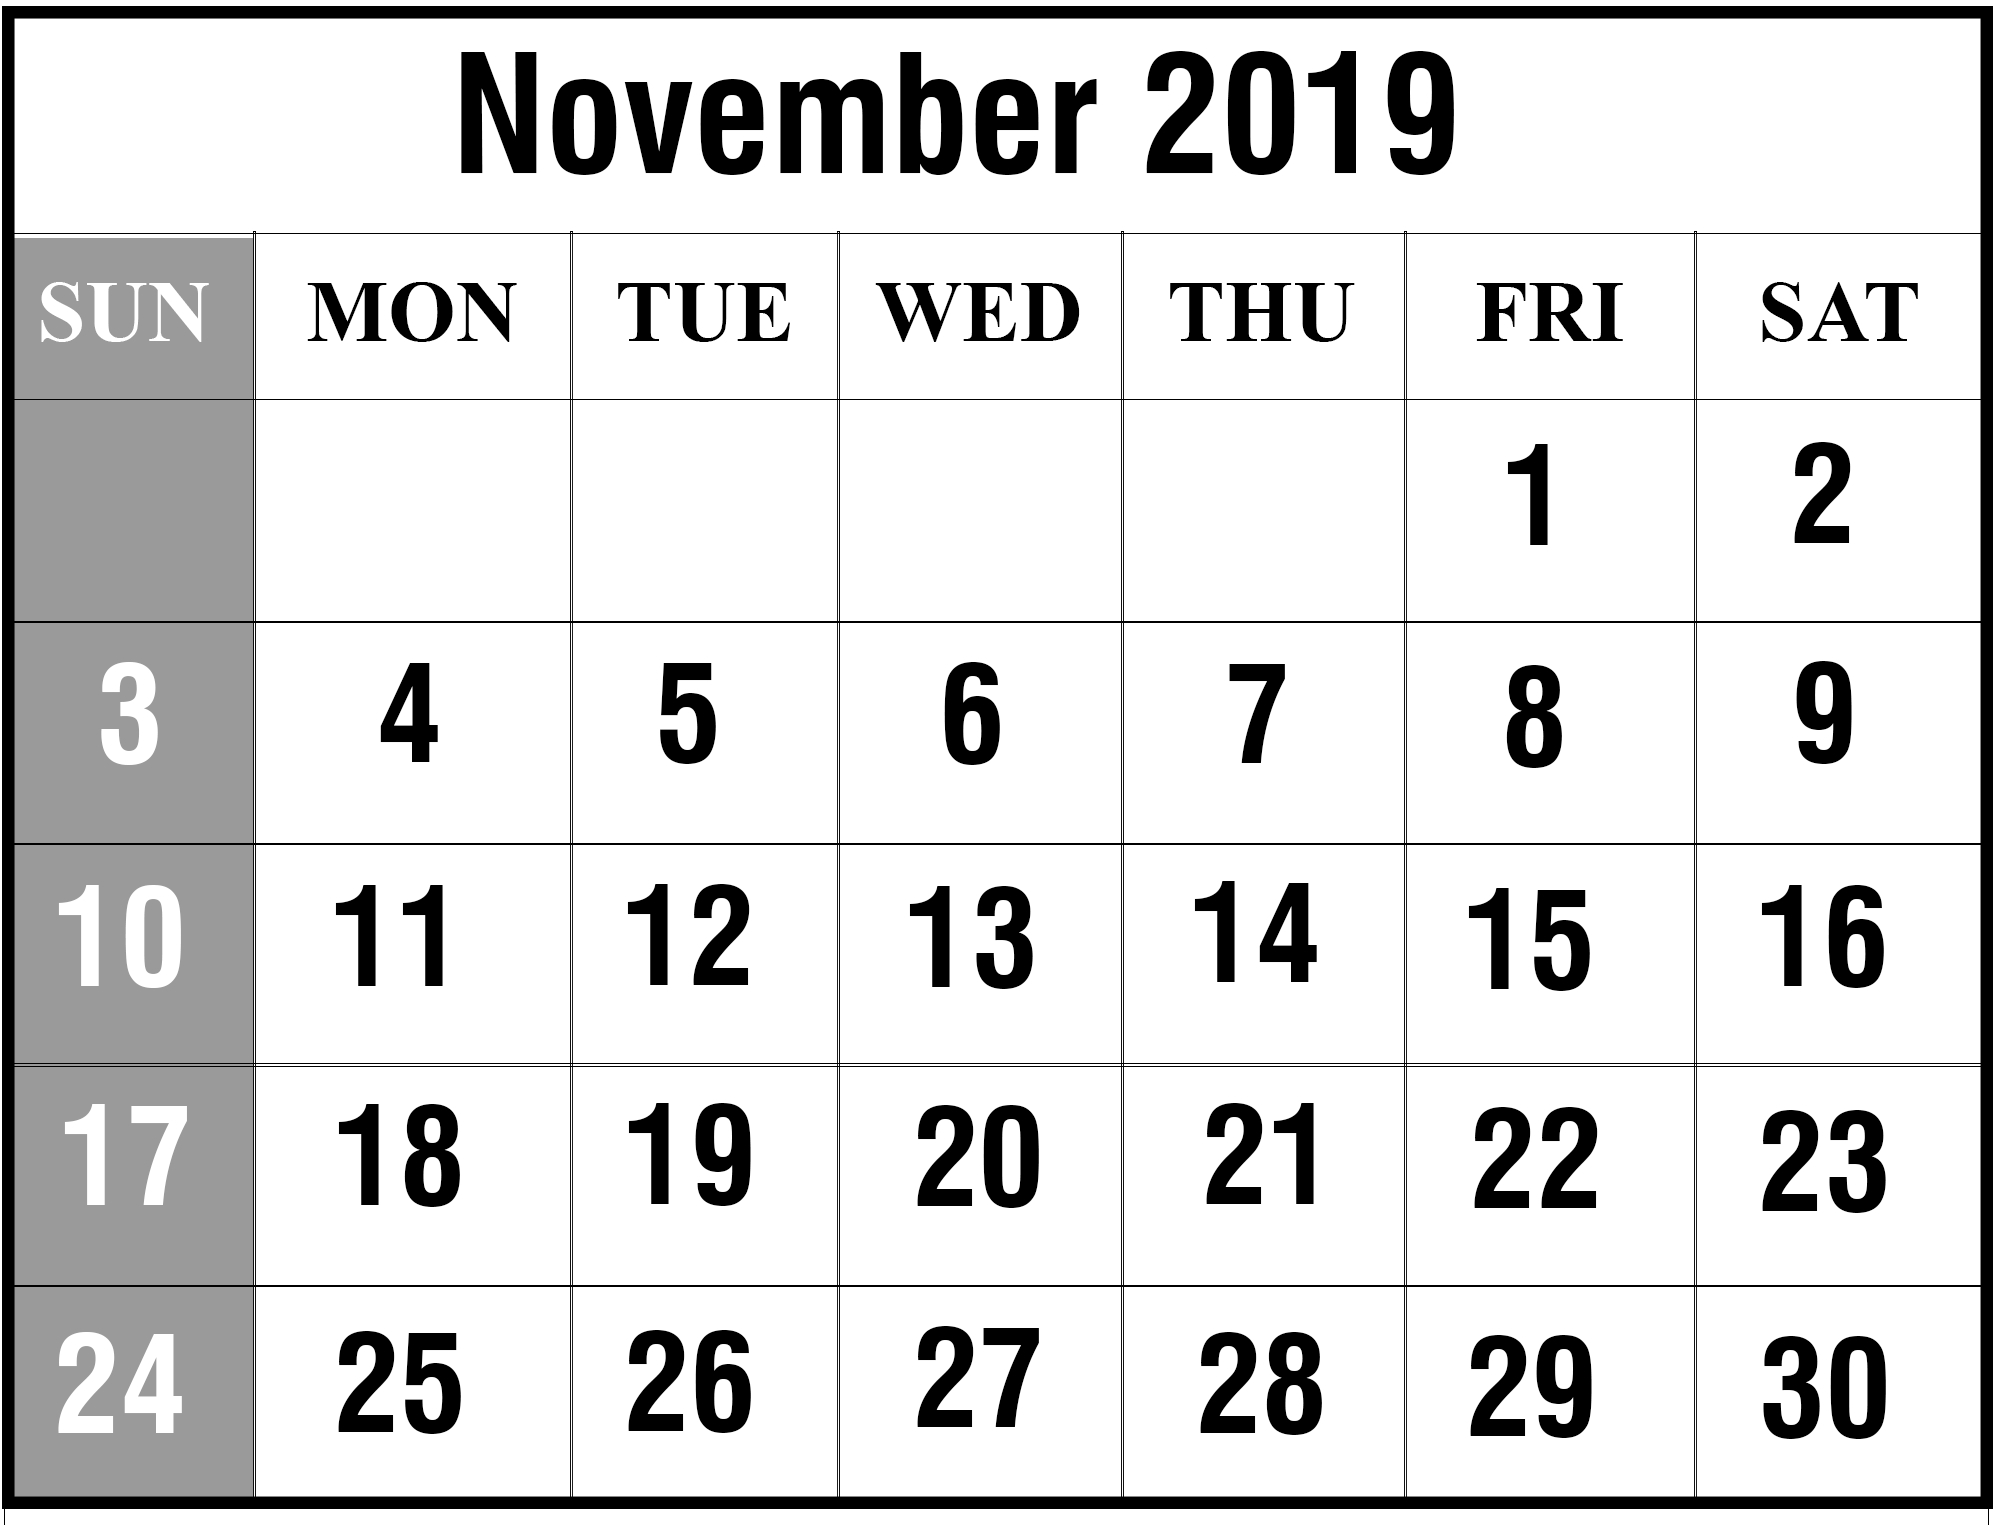 Free Blank November 2019 Printable Calendar In Pdf, Excel